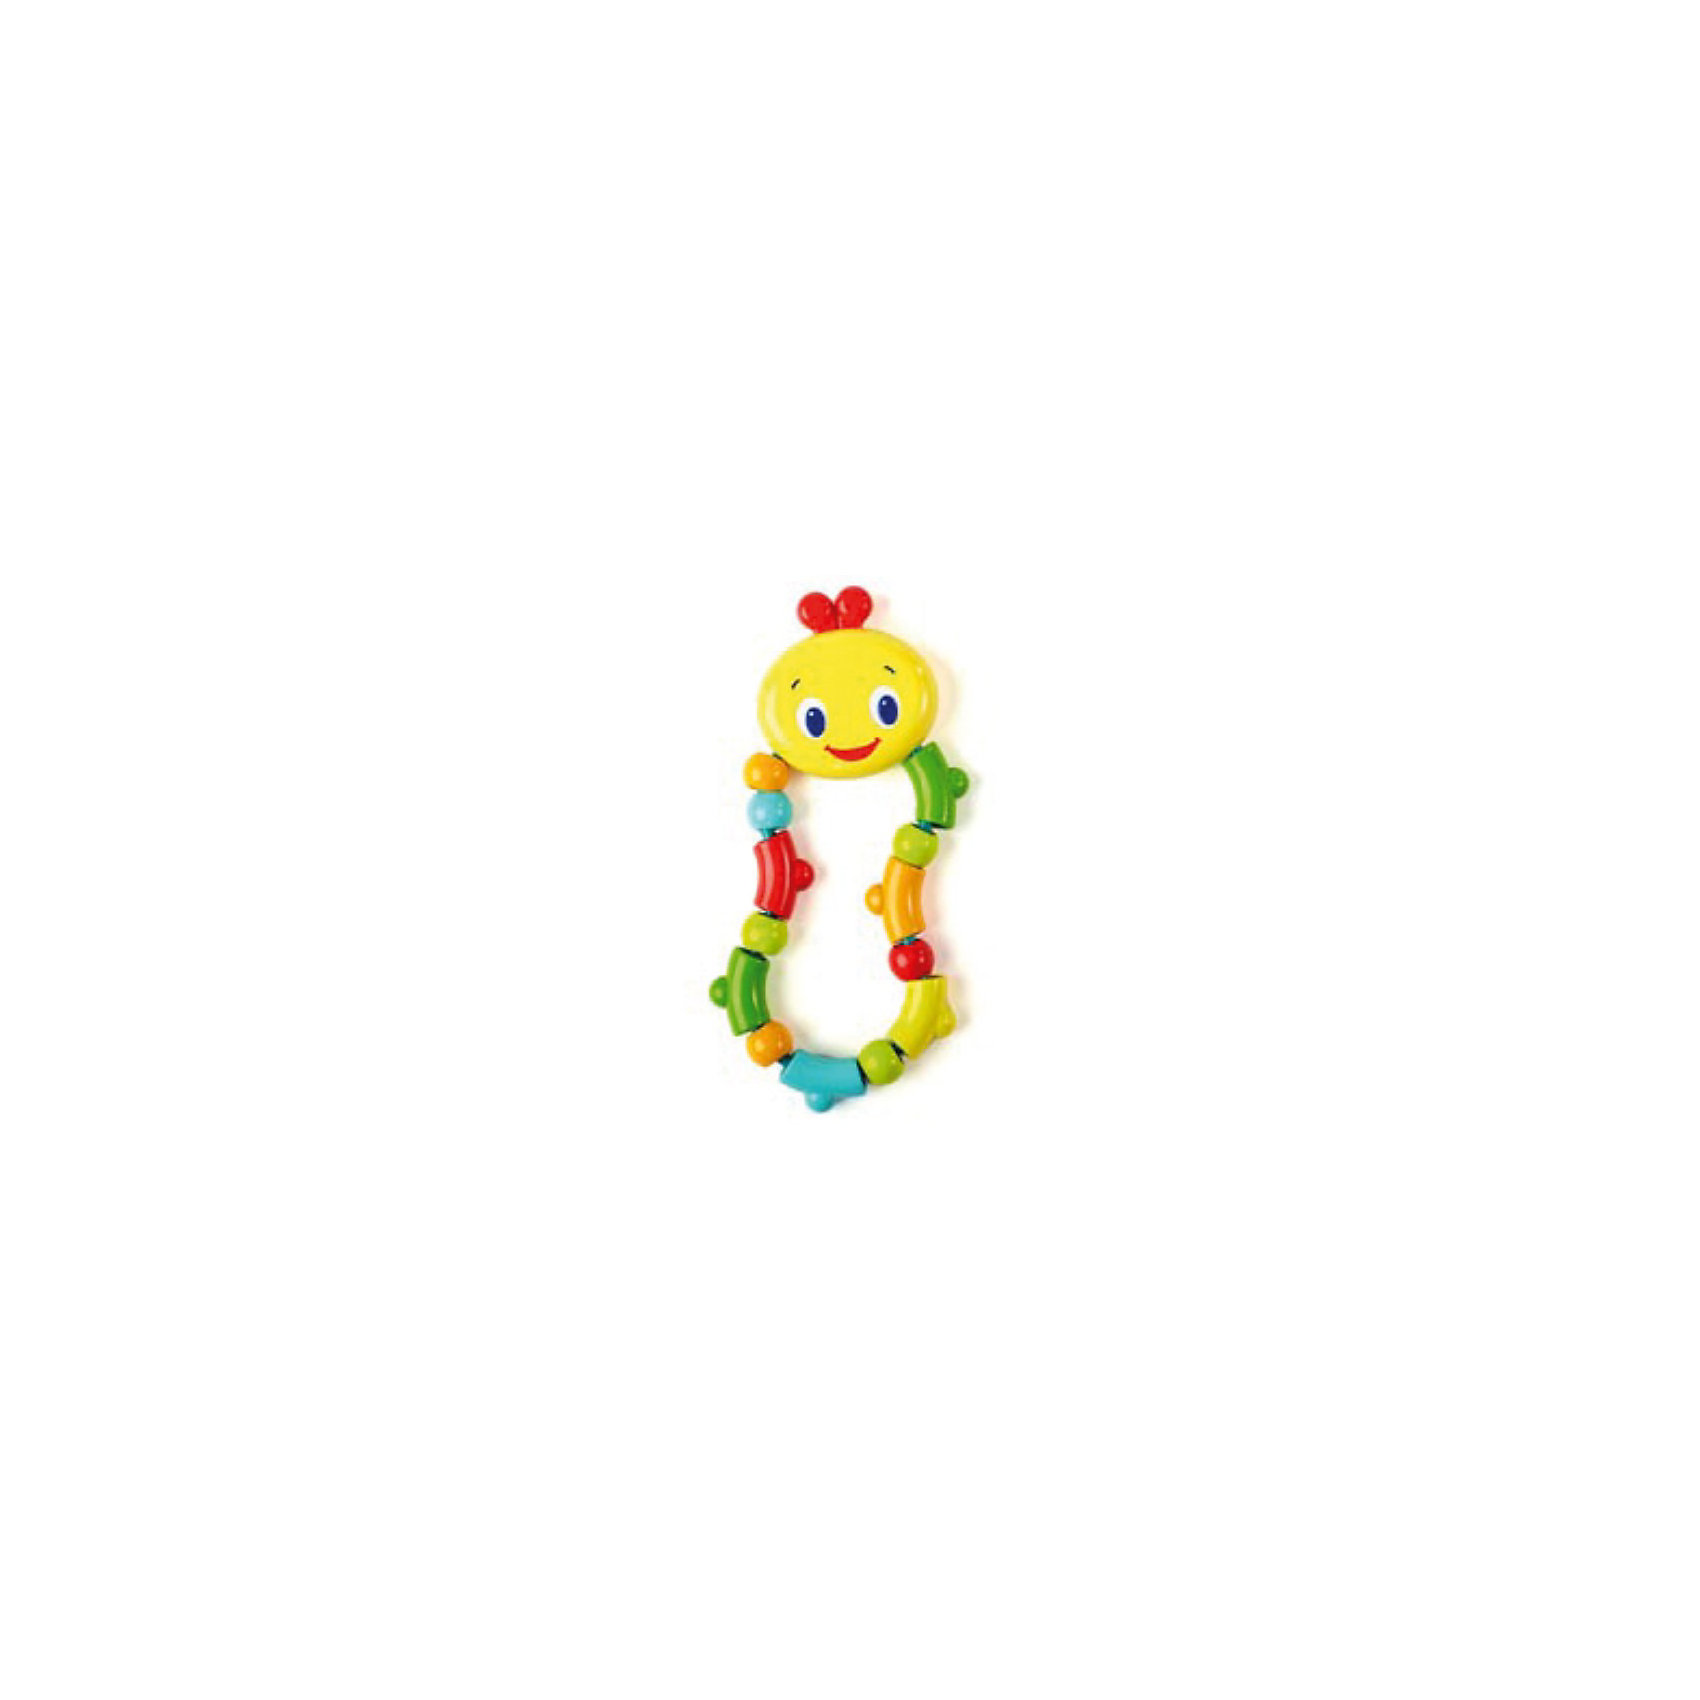 Bright Starts Развивающая игрушка-прорезыватель Гусеничка Bright Starts